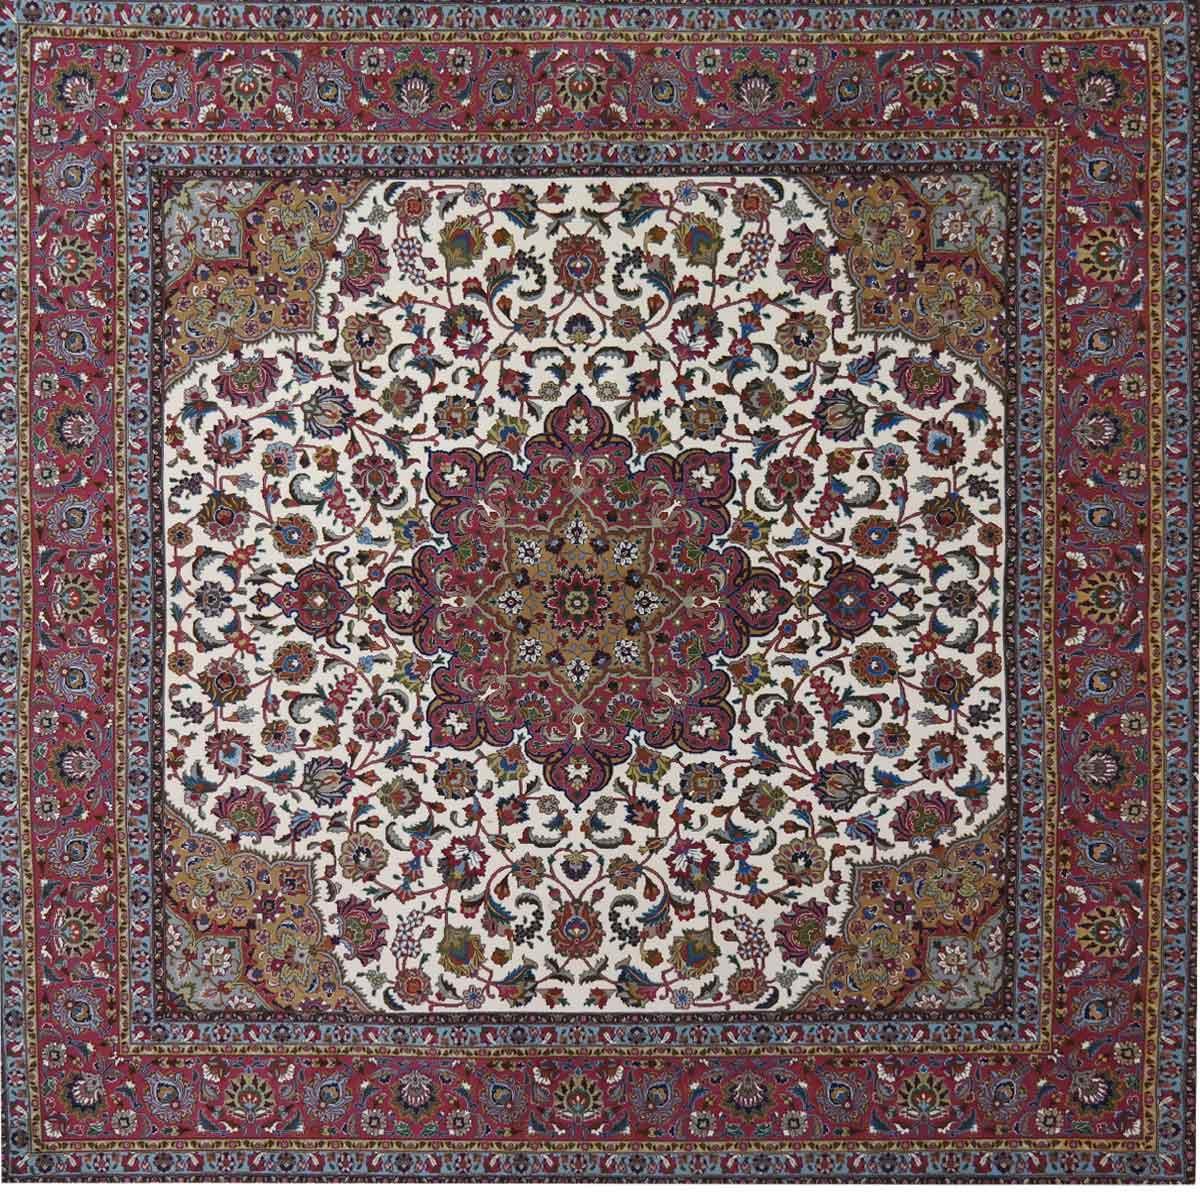 Tabriz 60 Raj carpet